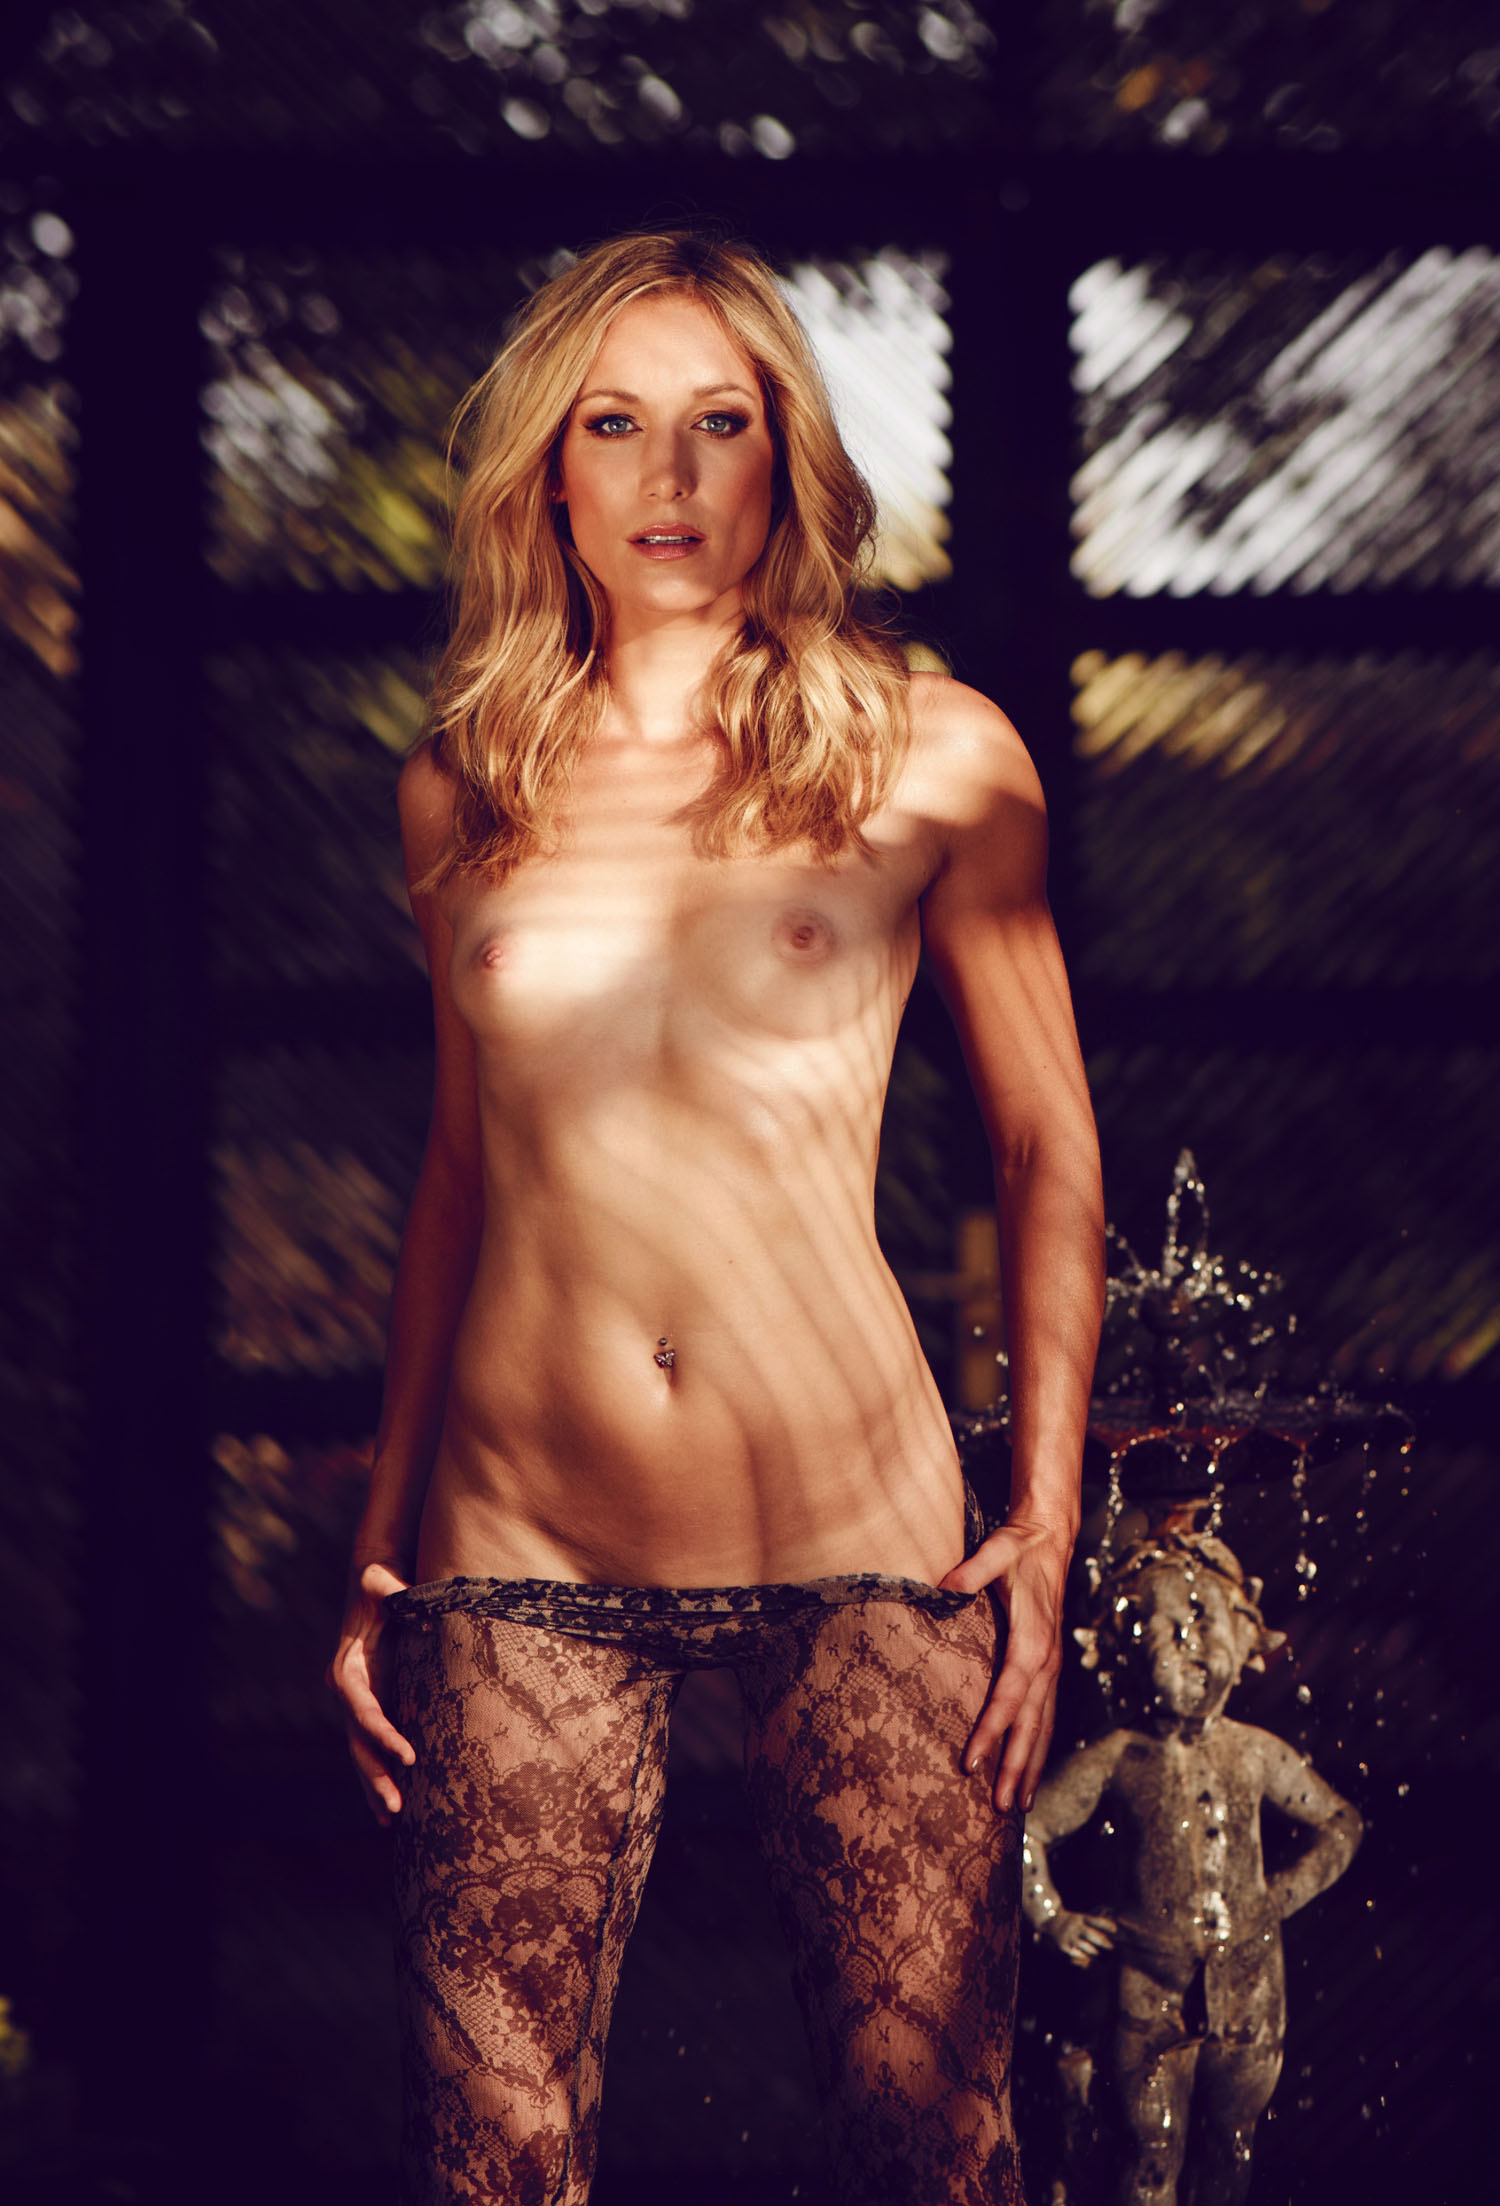 Кристин Тэйсс голая. Фото - 58